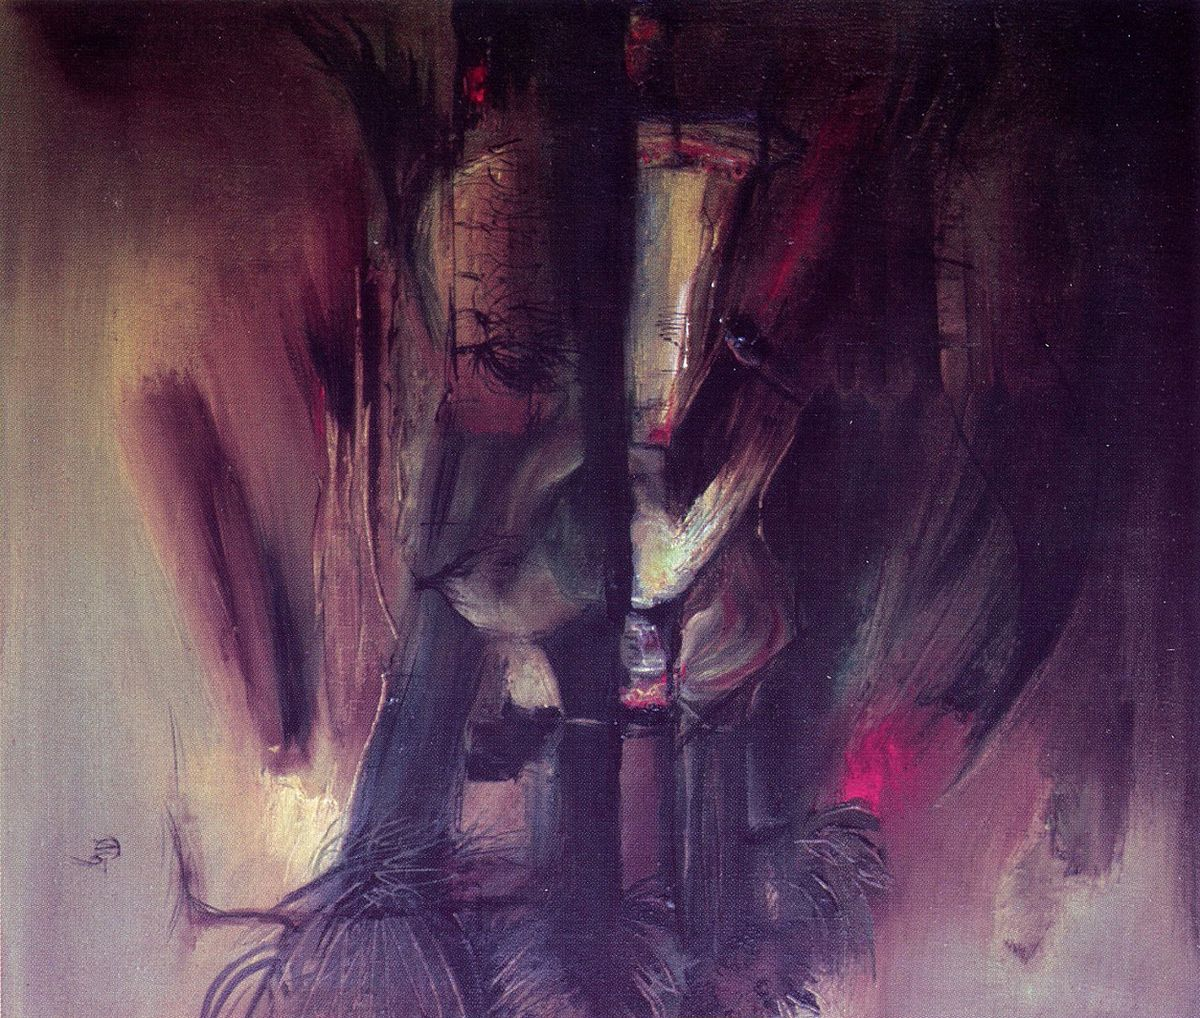 Євген Манишин. Передчуття, 1997